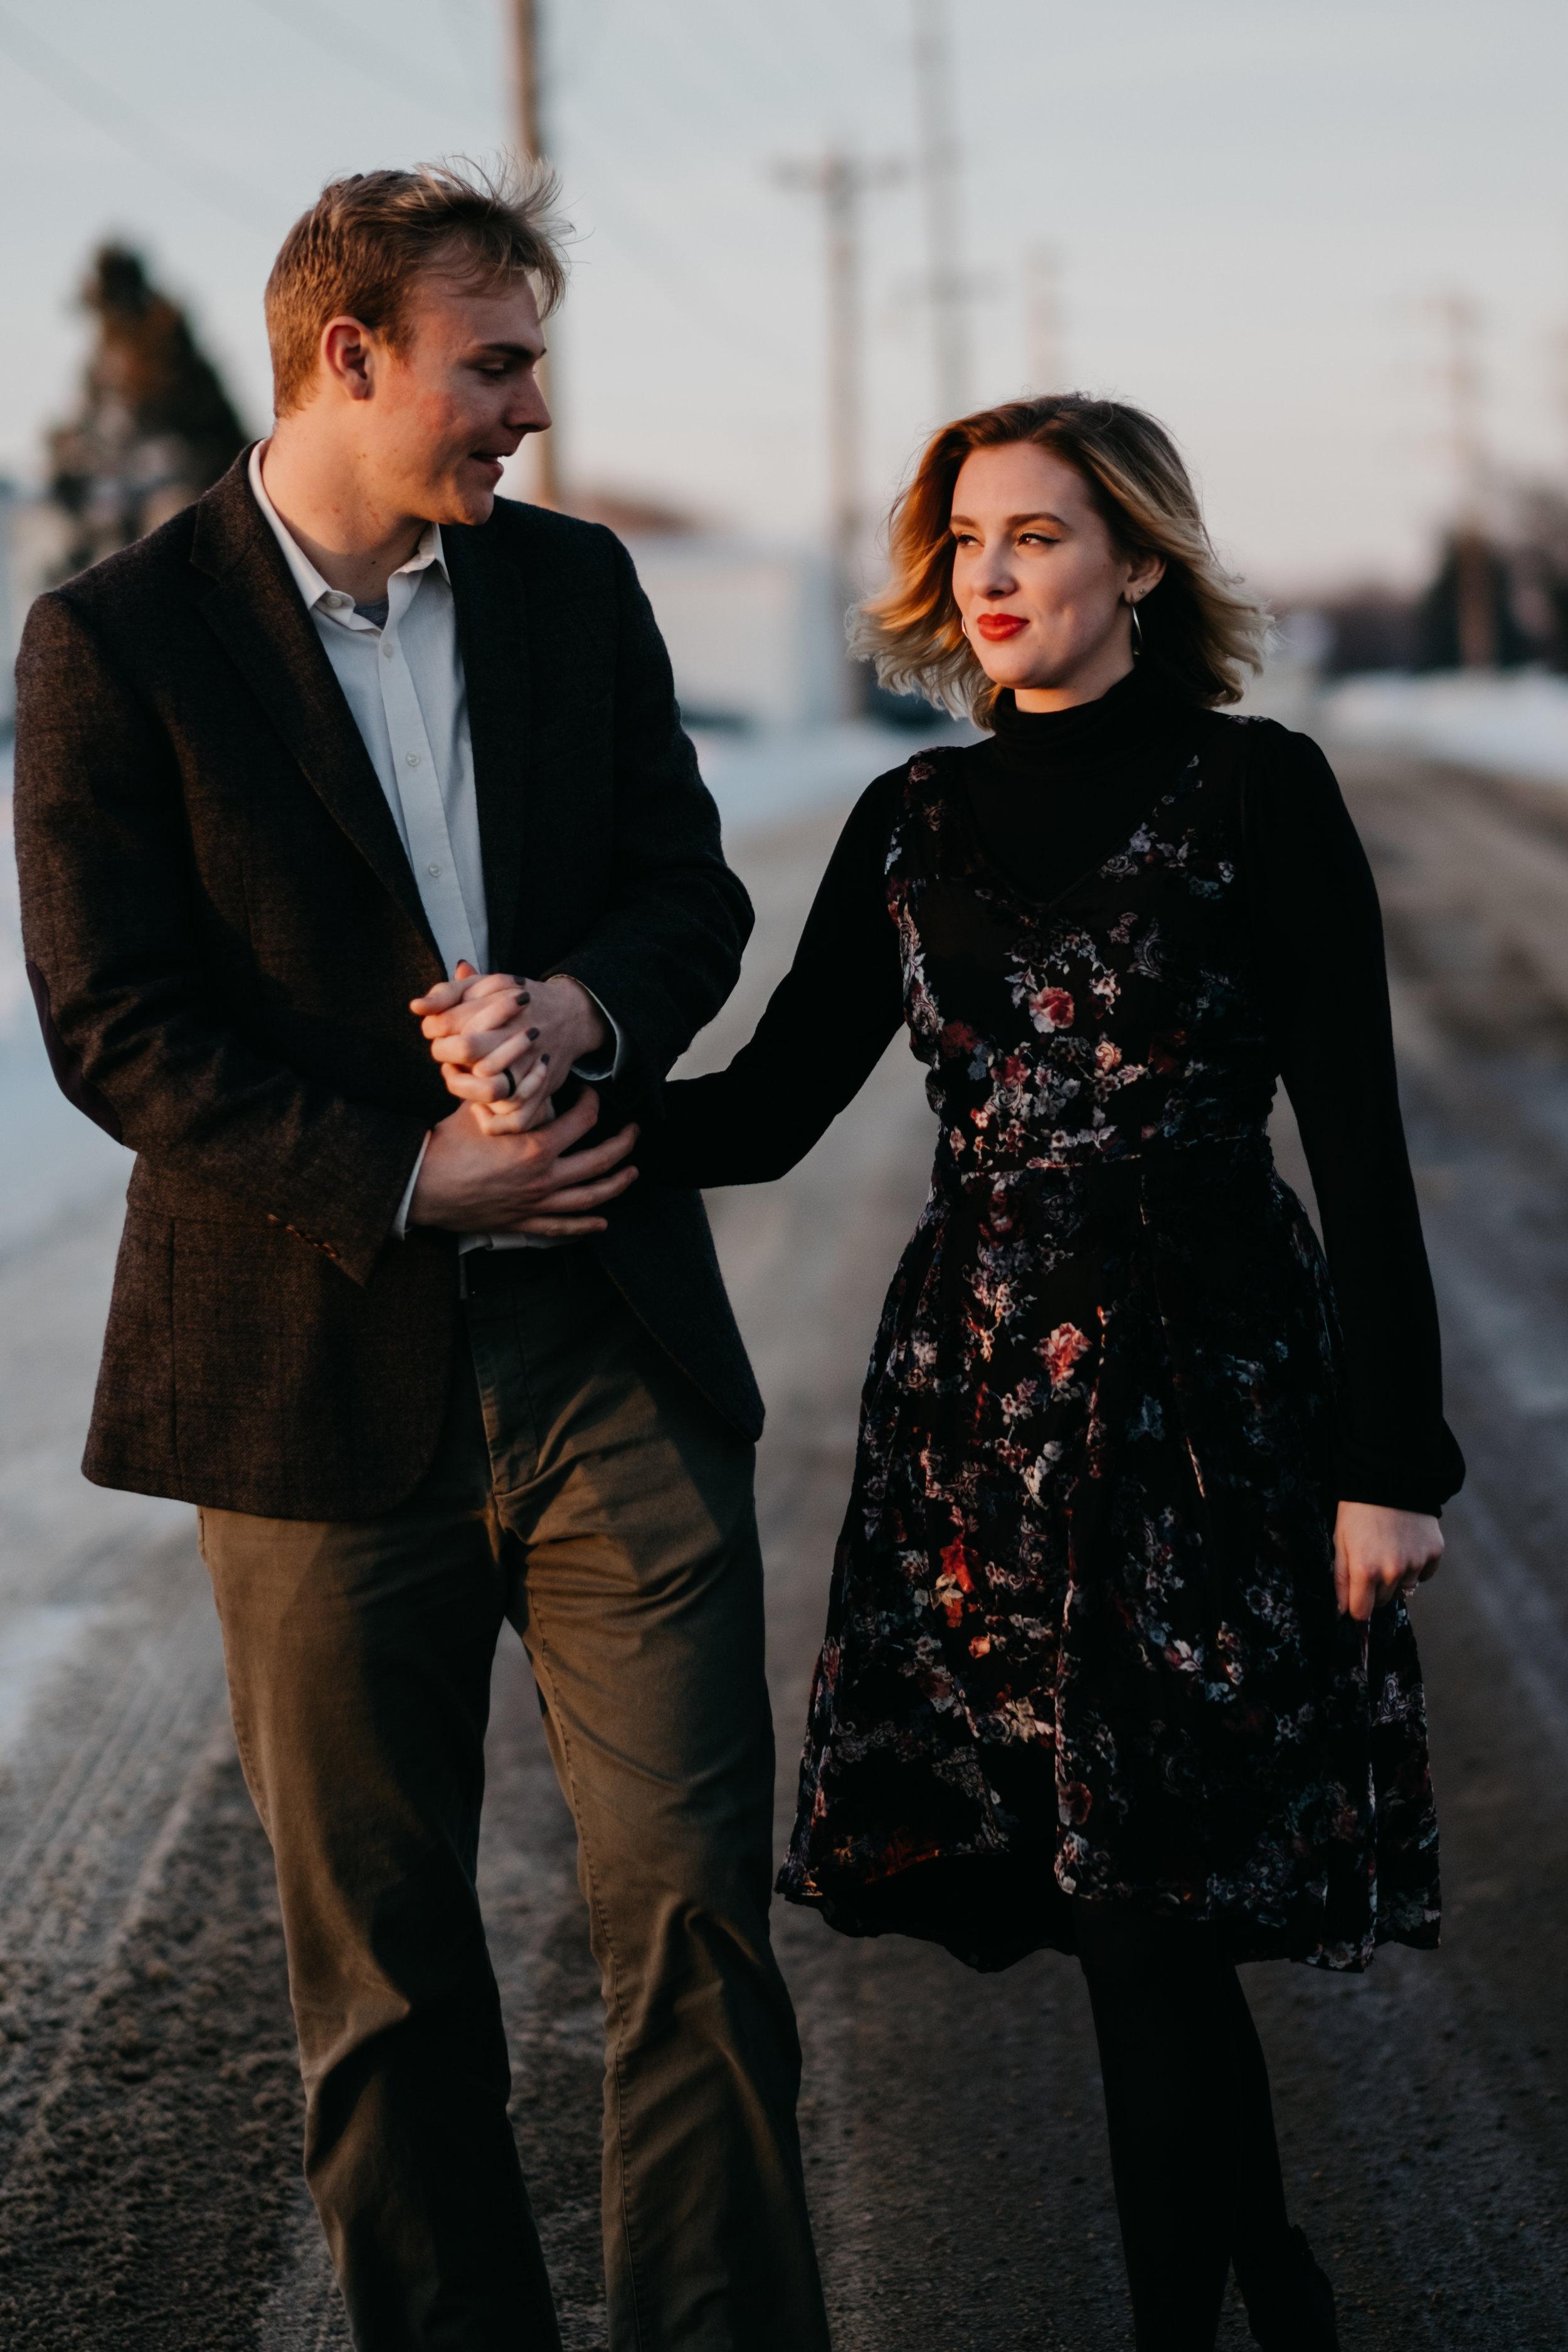 Talia + Brendan | Engagement Photography | Sioux Falls, South Dakota Photographer-134.jpg